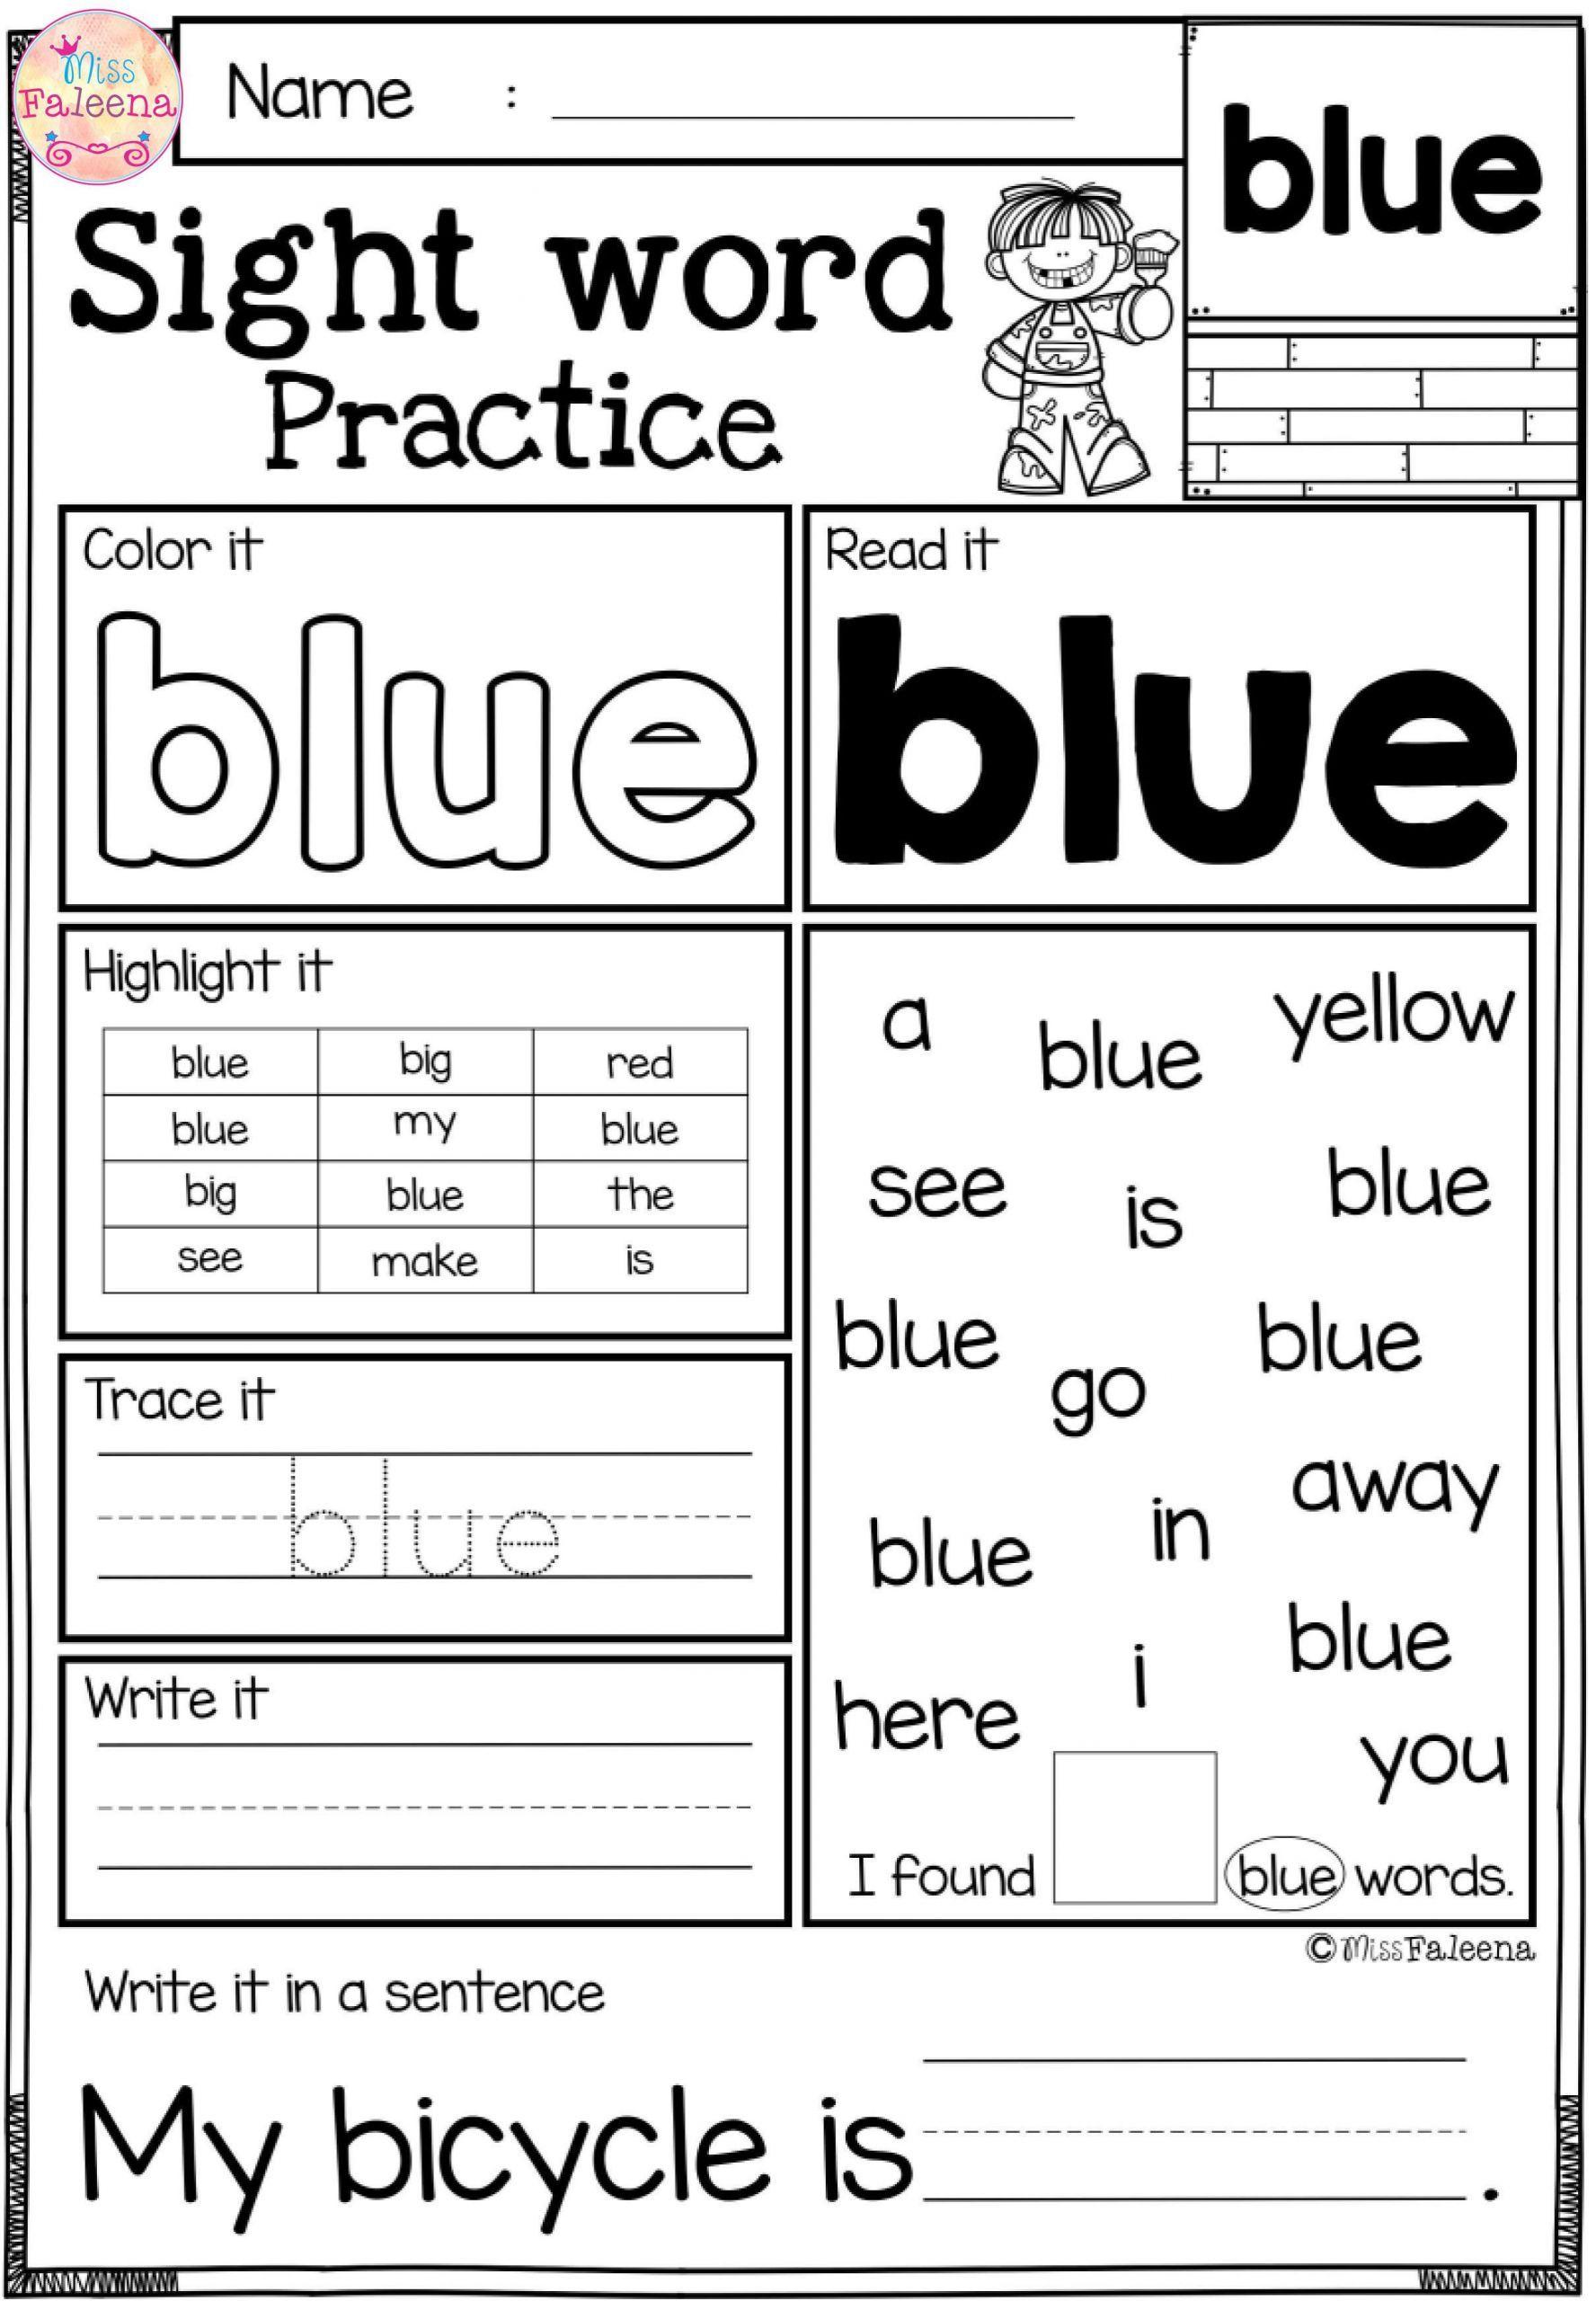 5 Kindergarten Worksheets Words Free Sight Word Practice Kindergarten Worksheets Sight Words Sight Word Worksheets Preschool Sight Words